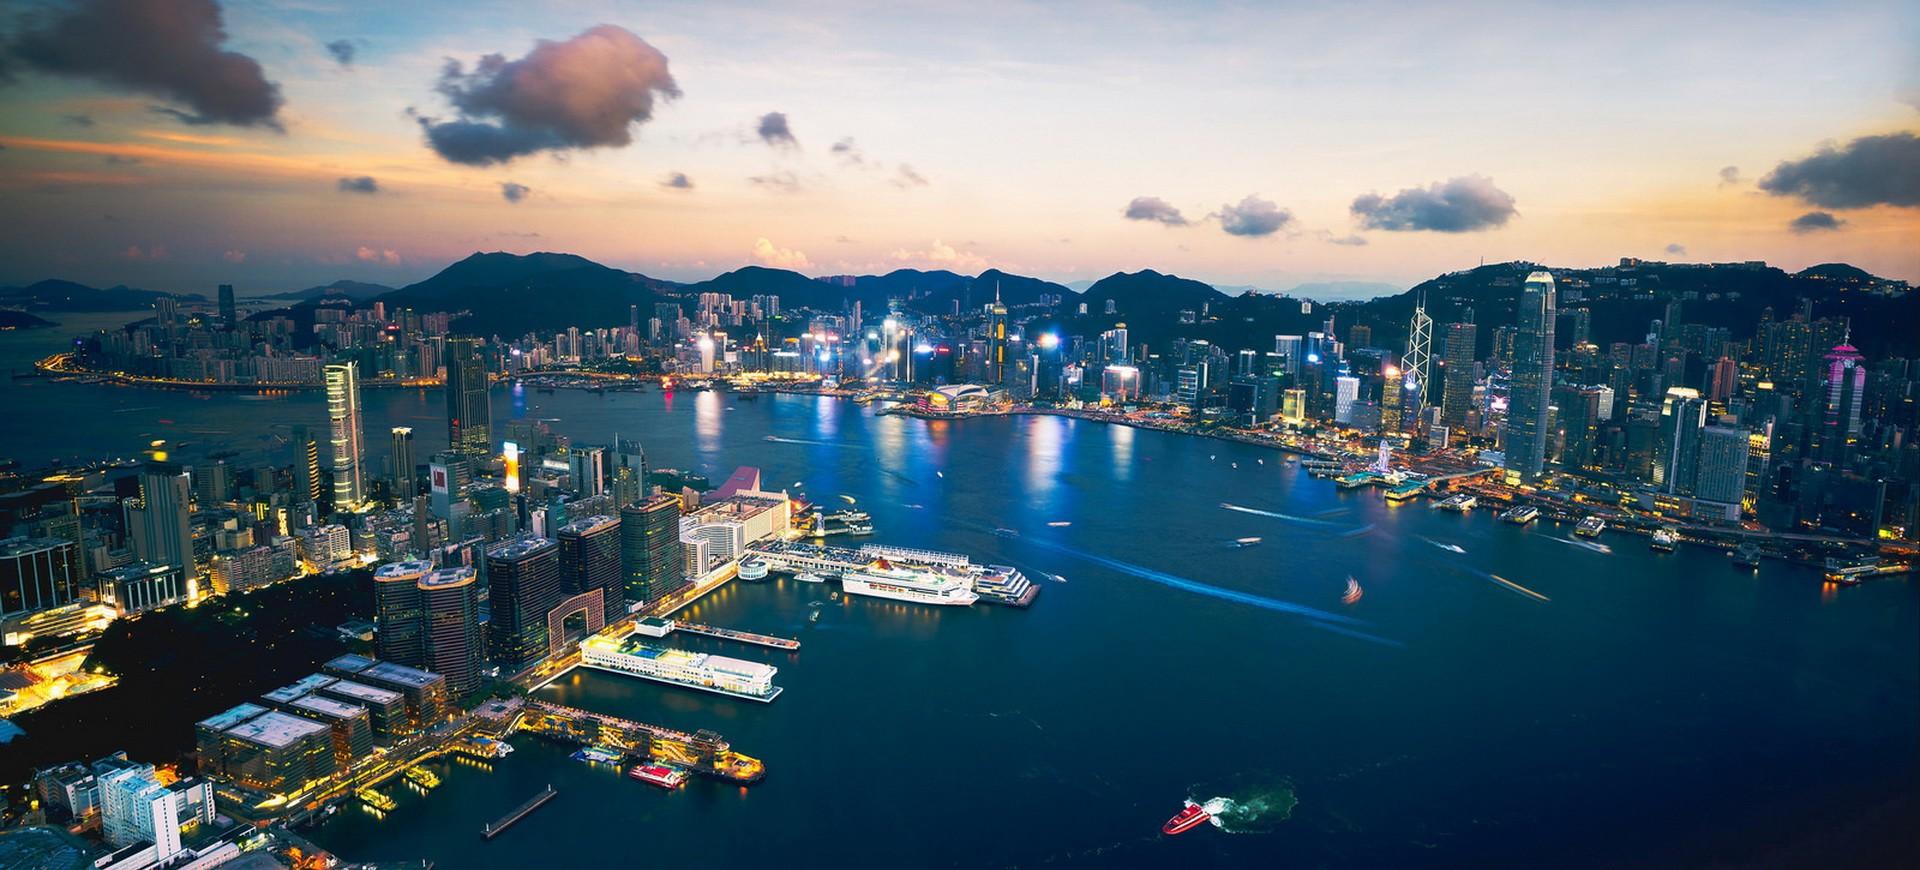 Hong Kong Baie et Skyline by night 002